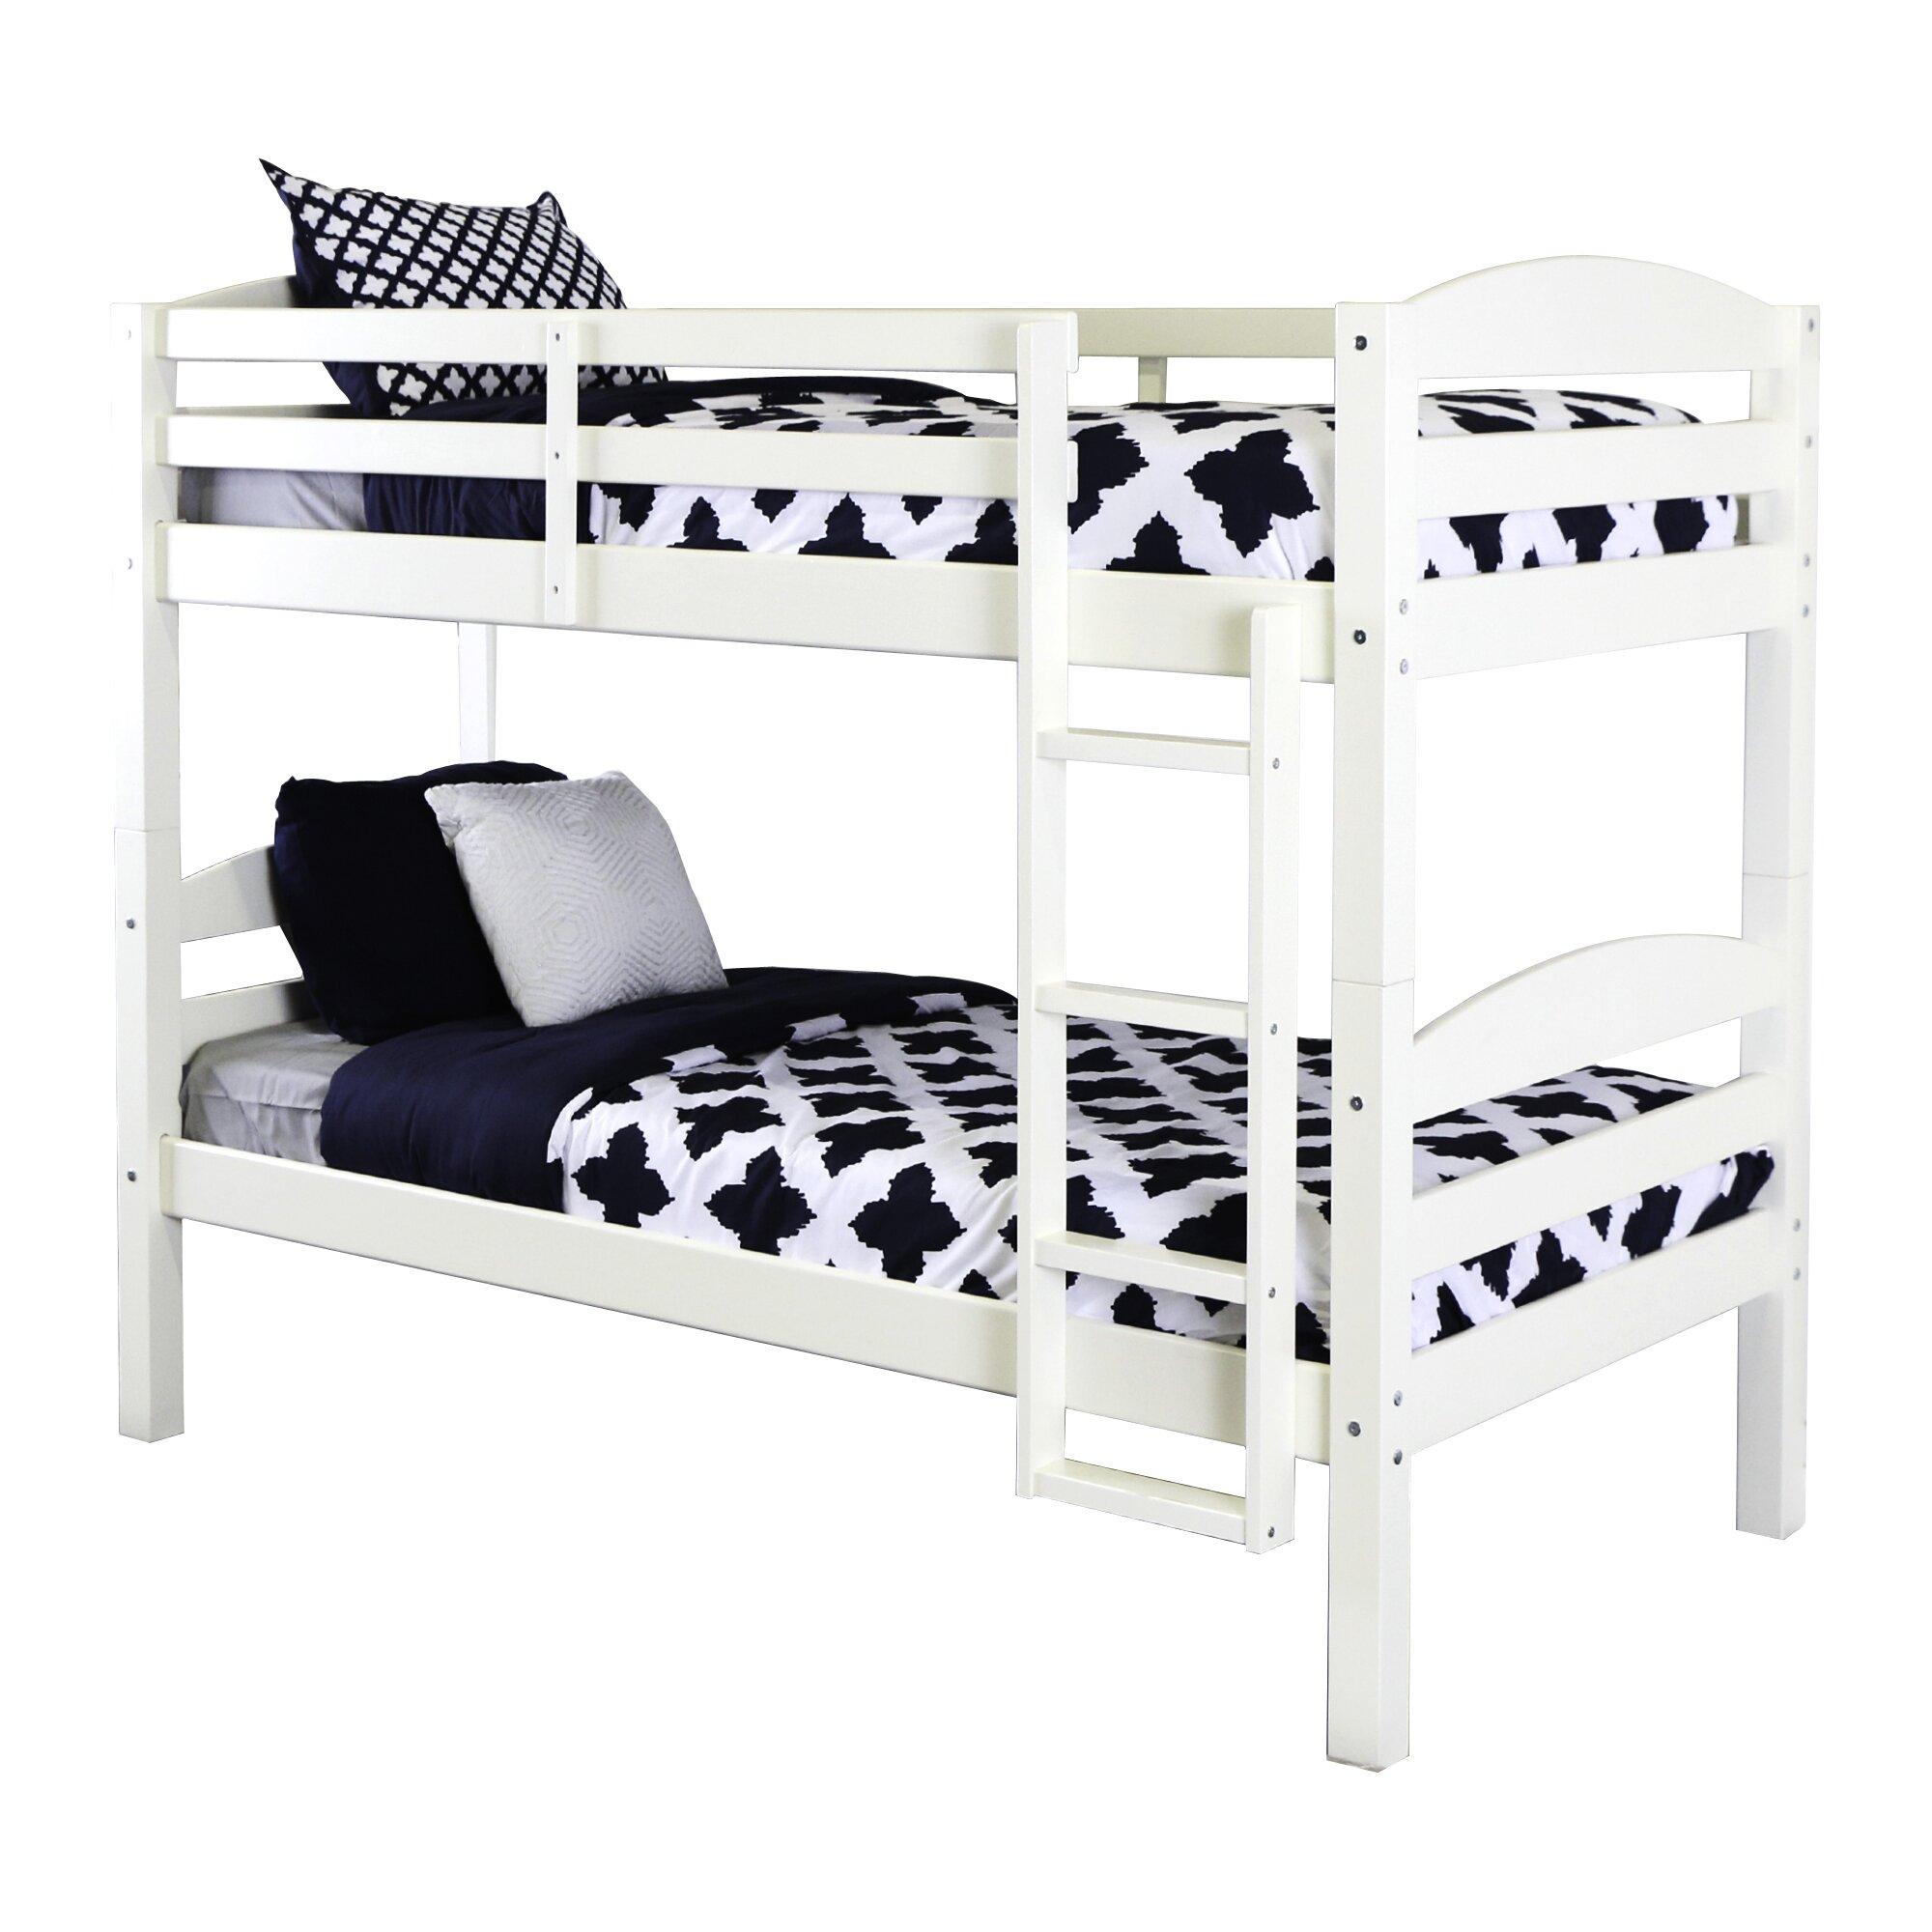 Home loft concepts twin bunk bed reviews wayfair for Concept beds